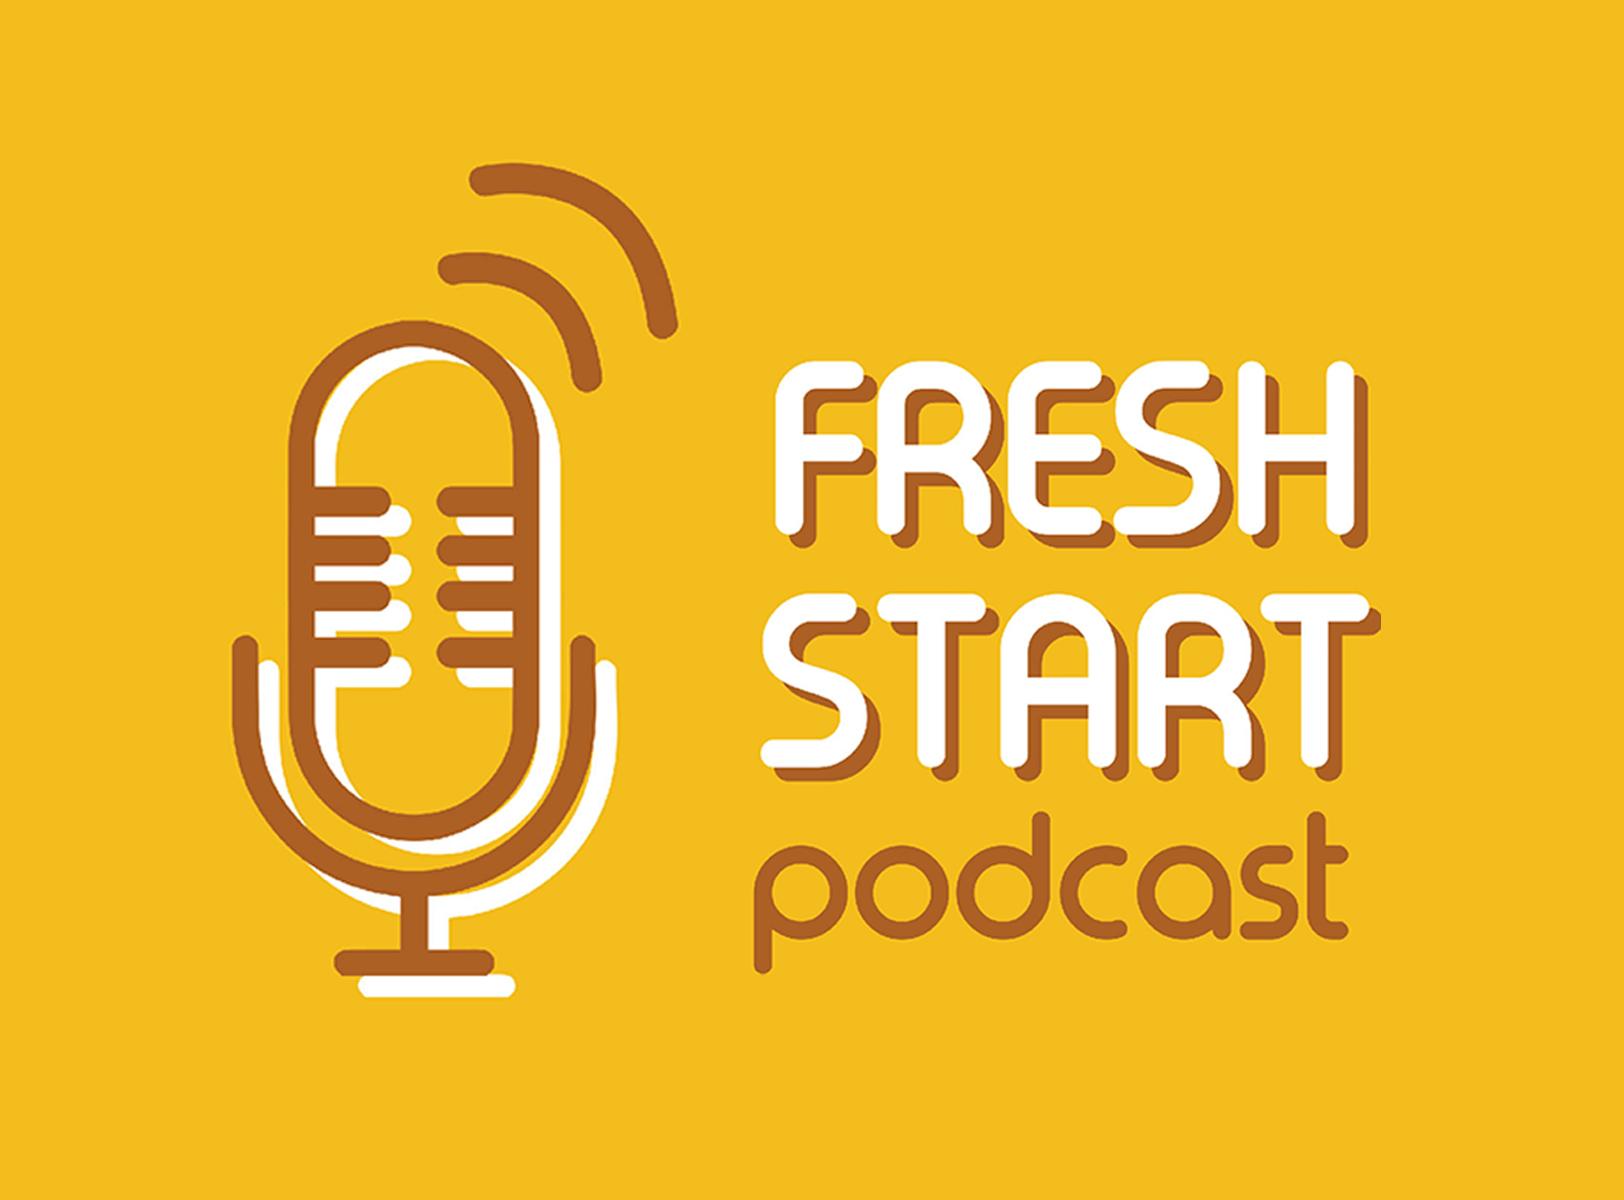 Fresh Start: Podcast News (4/11/2019 Thu.)